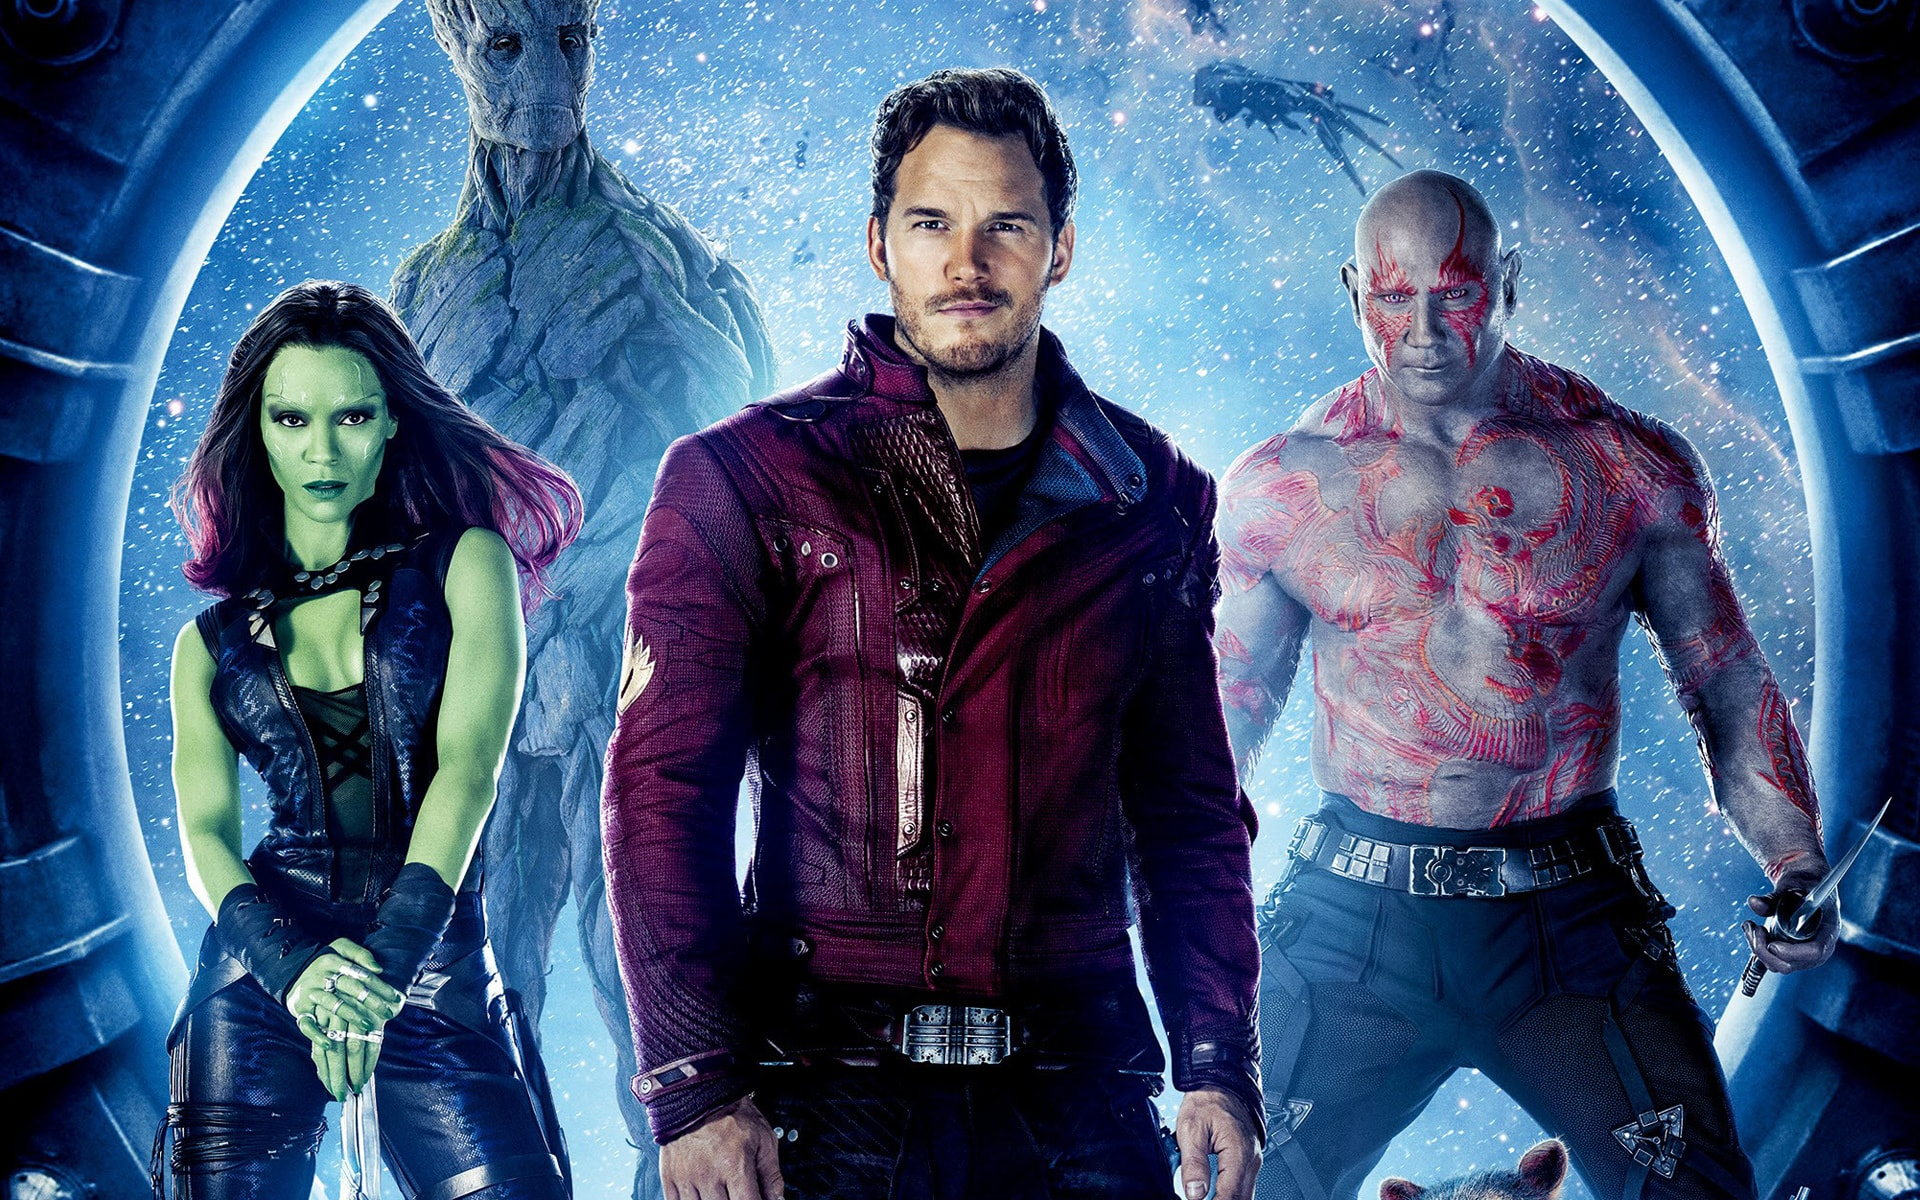 Guardians Of The Galaxy widescreen for desktop